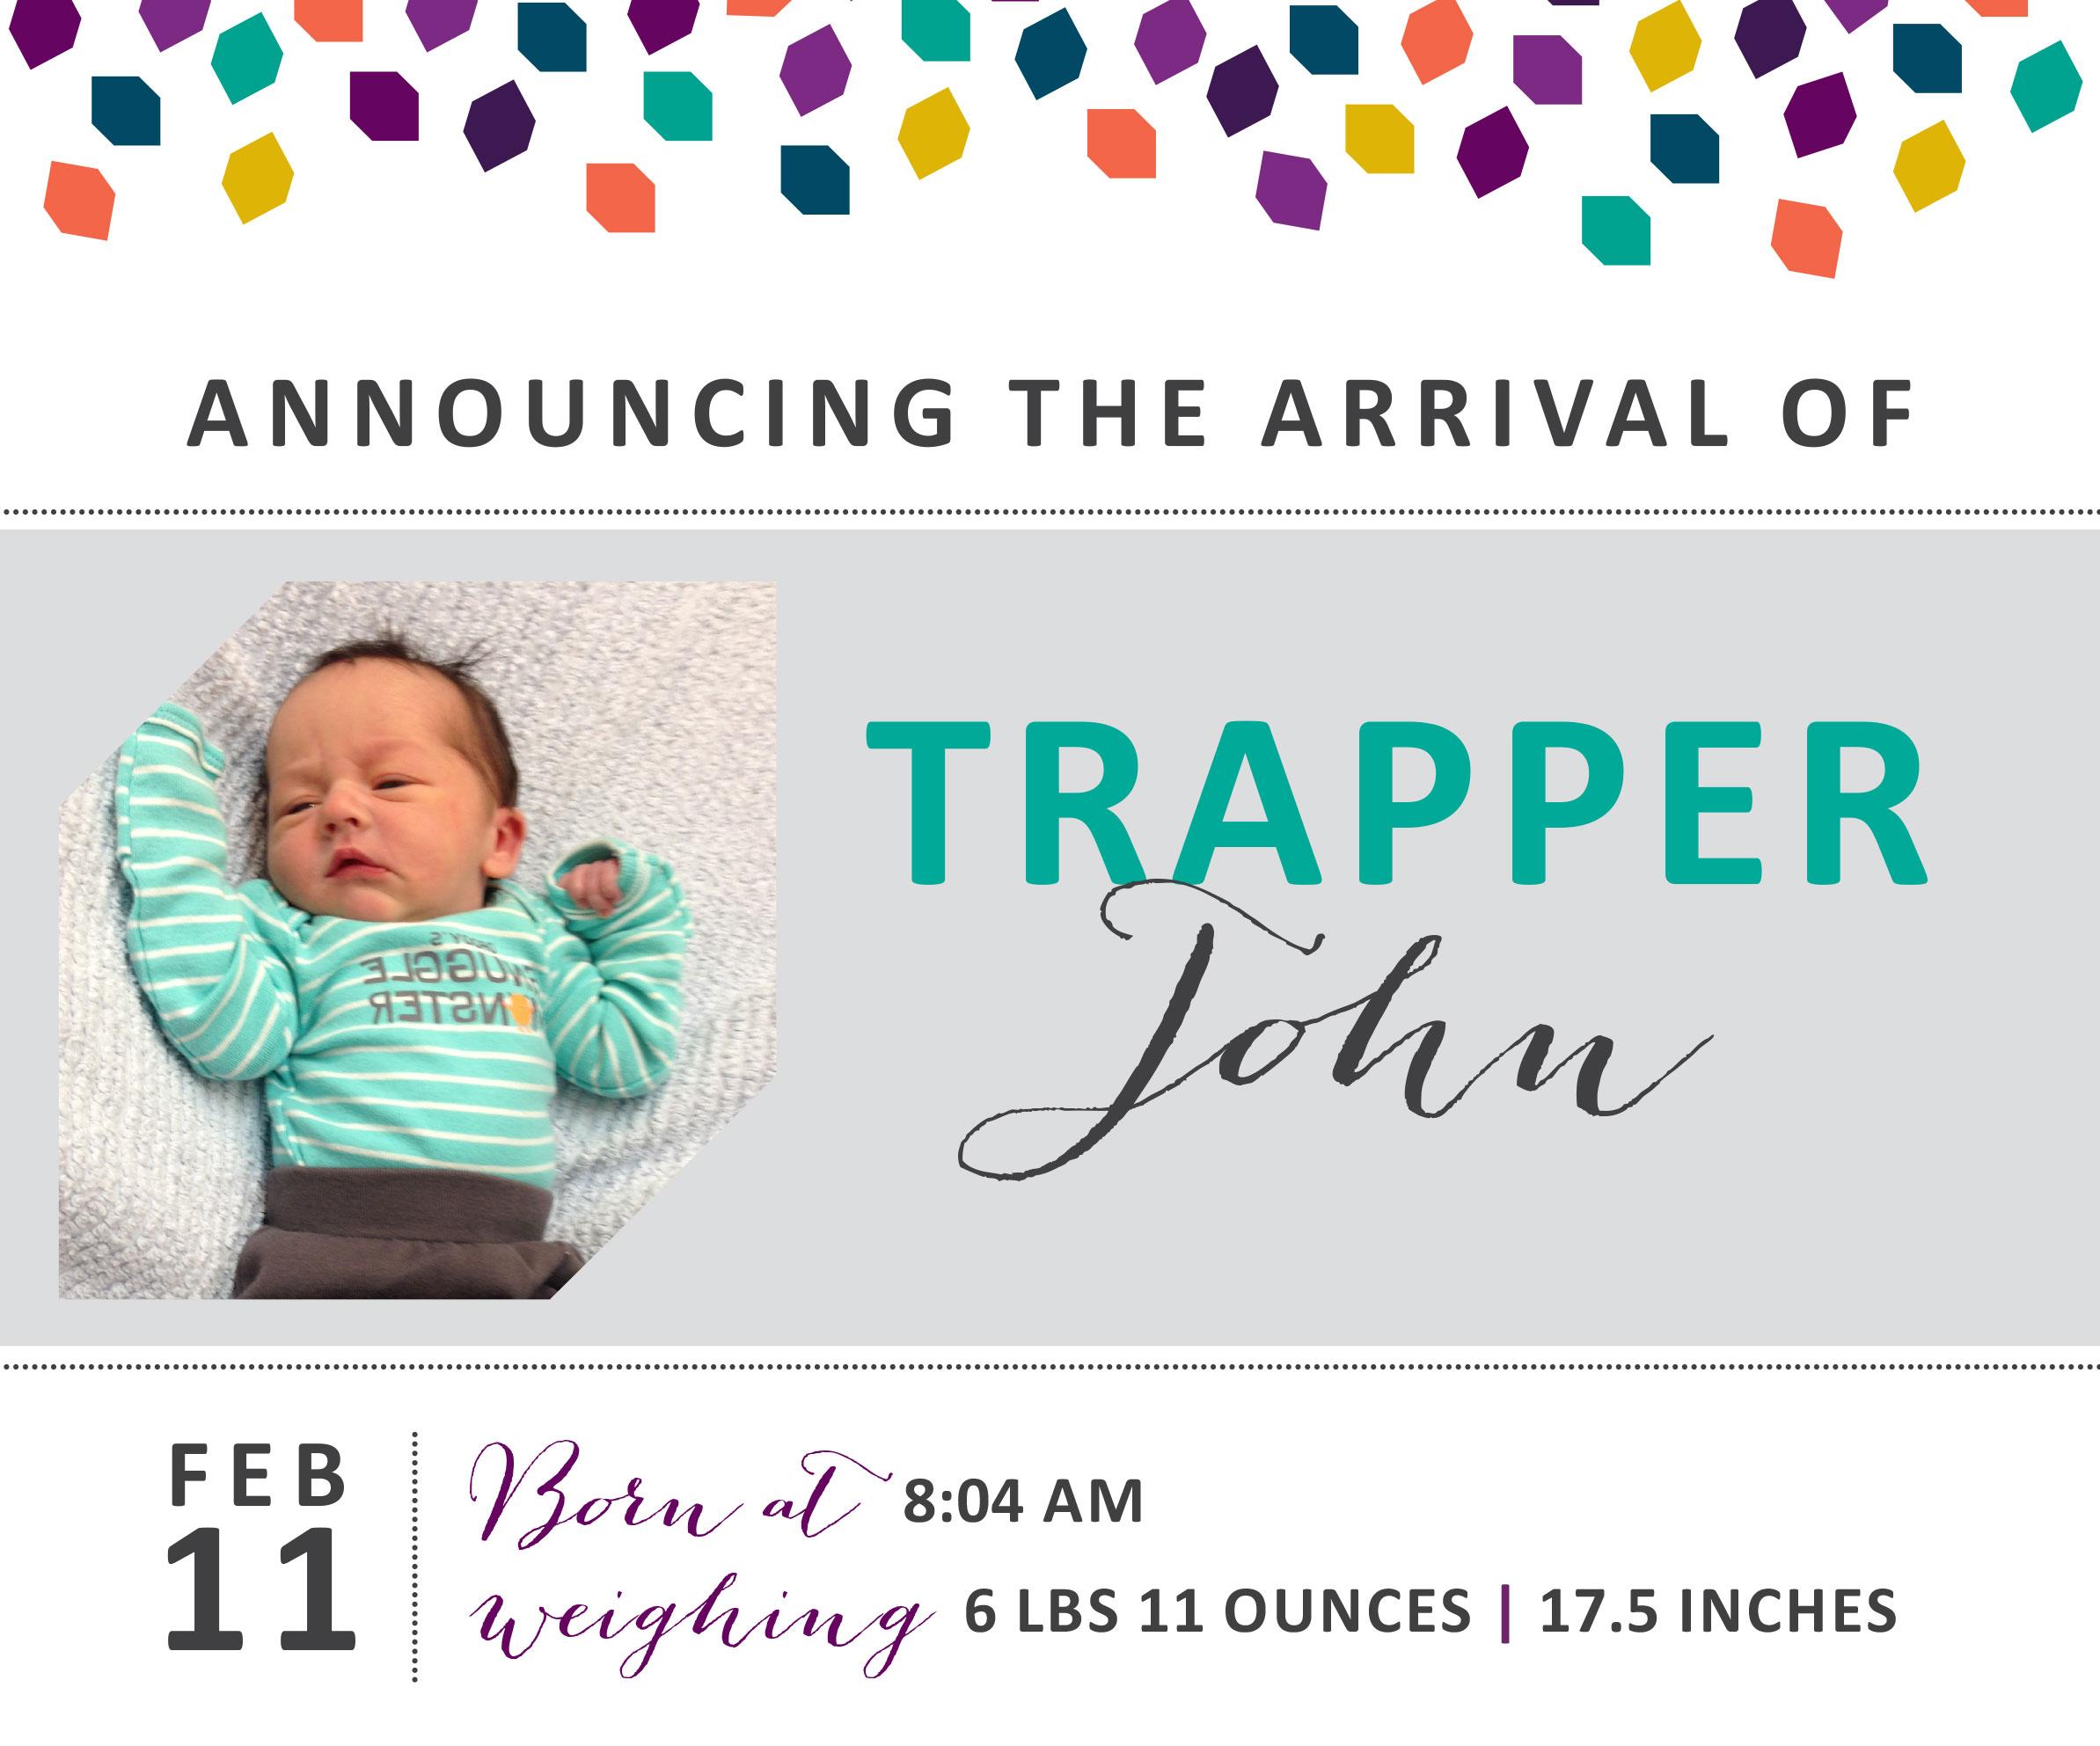 Trapper John 3